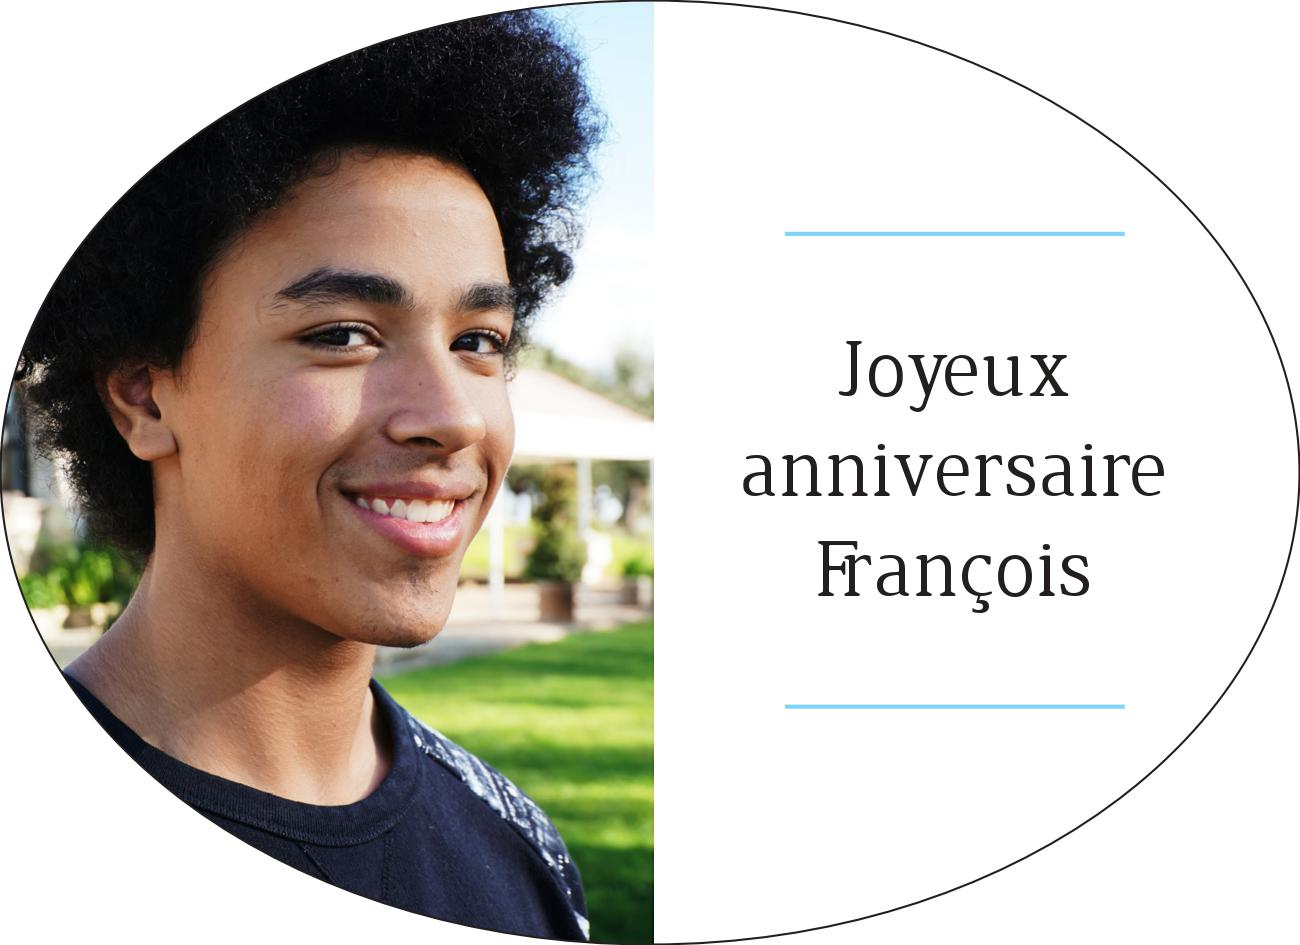 birthday-children-francois_has-image